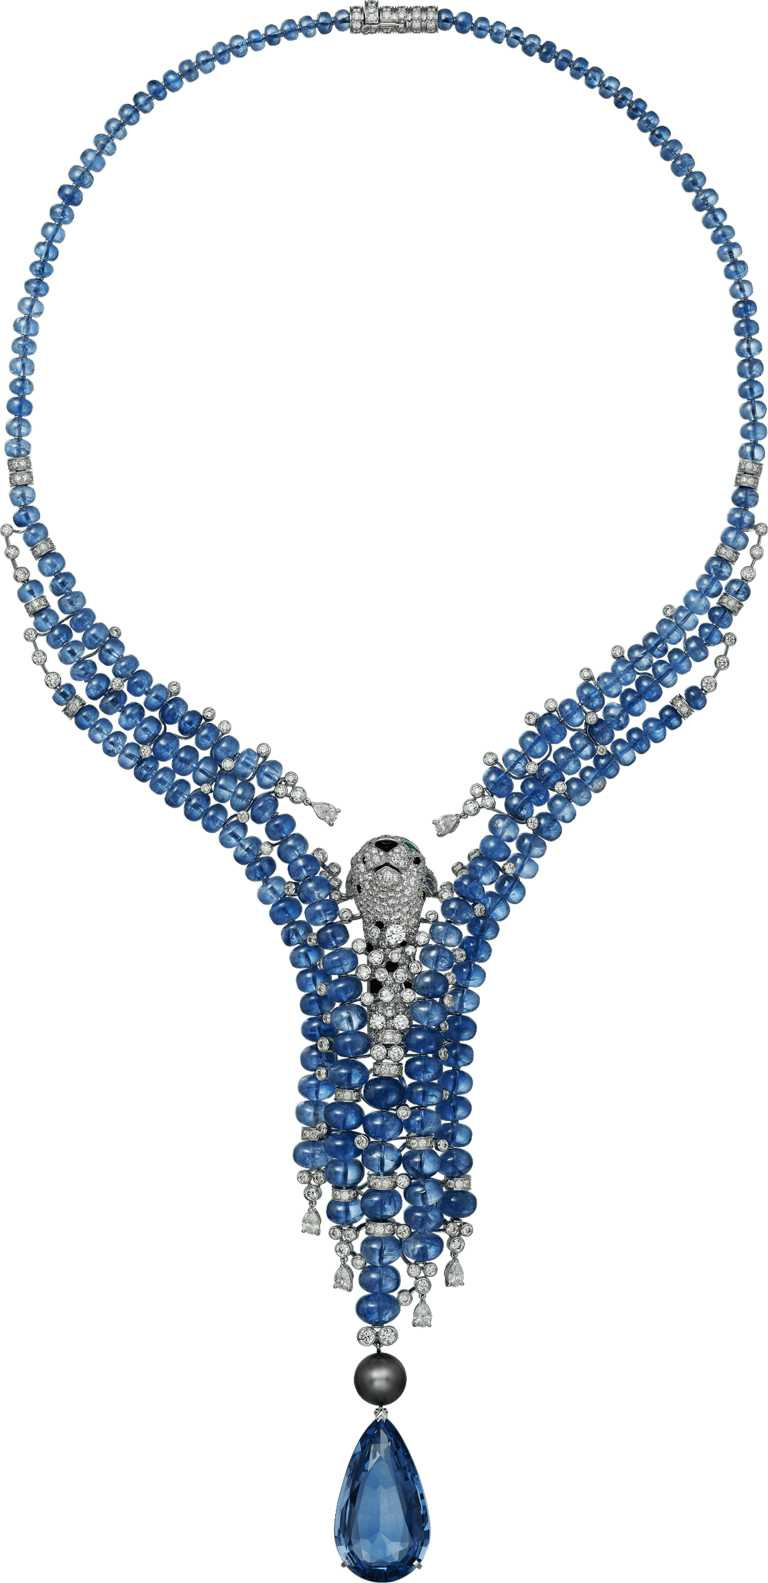 Cartier「L'AVENTUREUSE冒險的」美洲豹藍寶石項鍊╱61,000,000元。(圖╱Cartier提供)